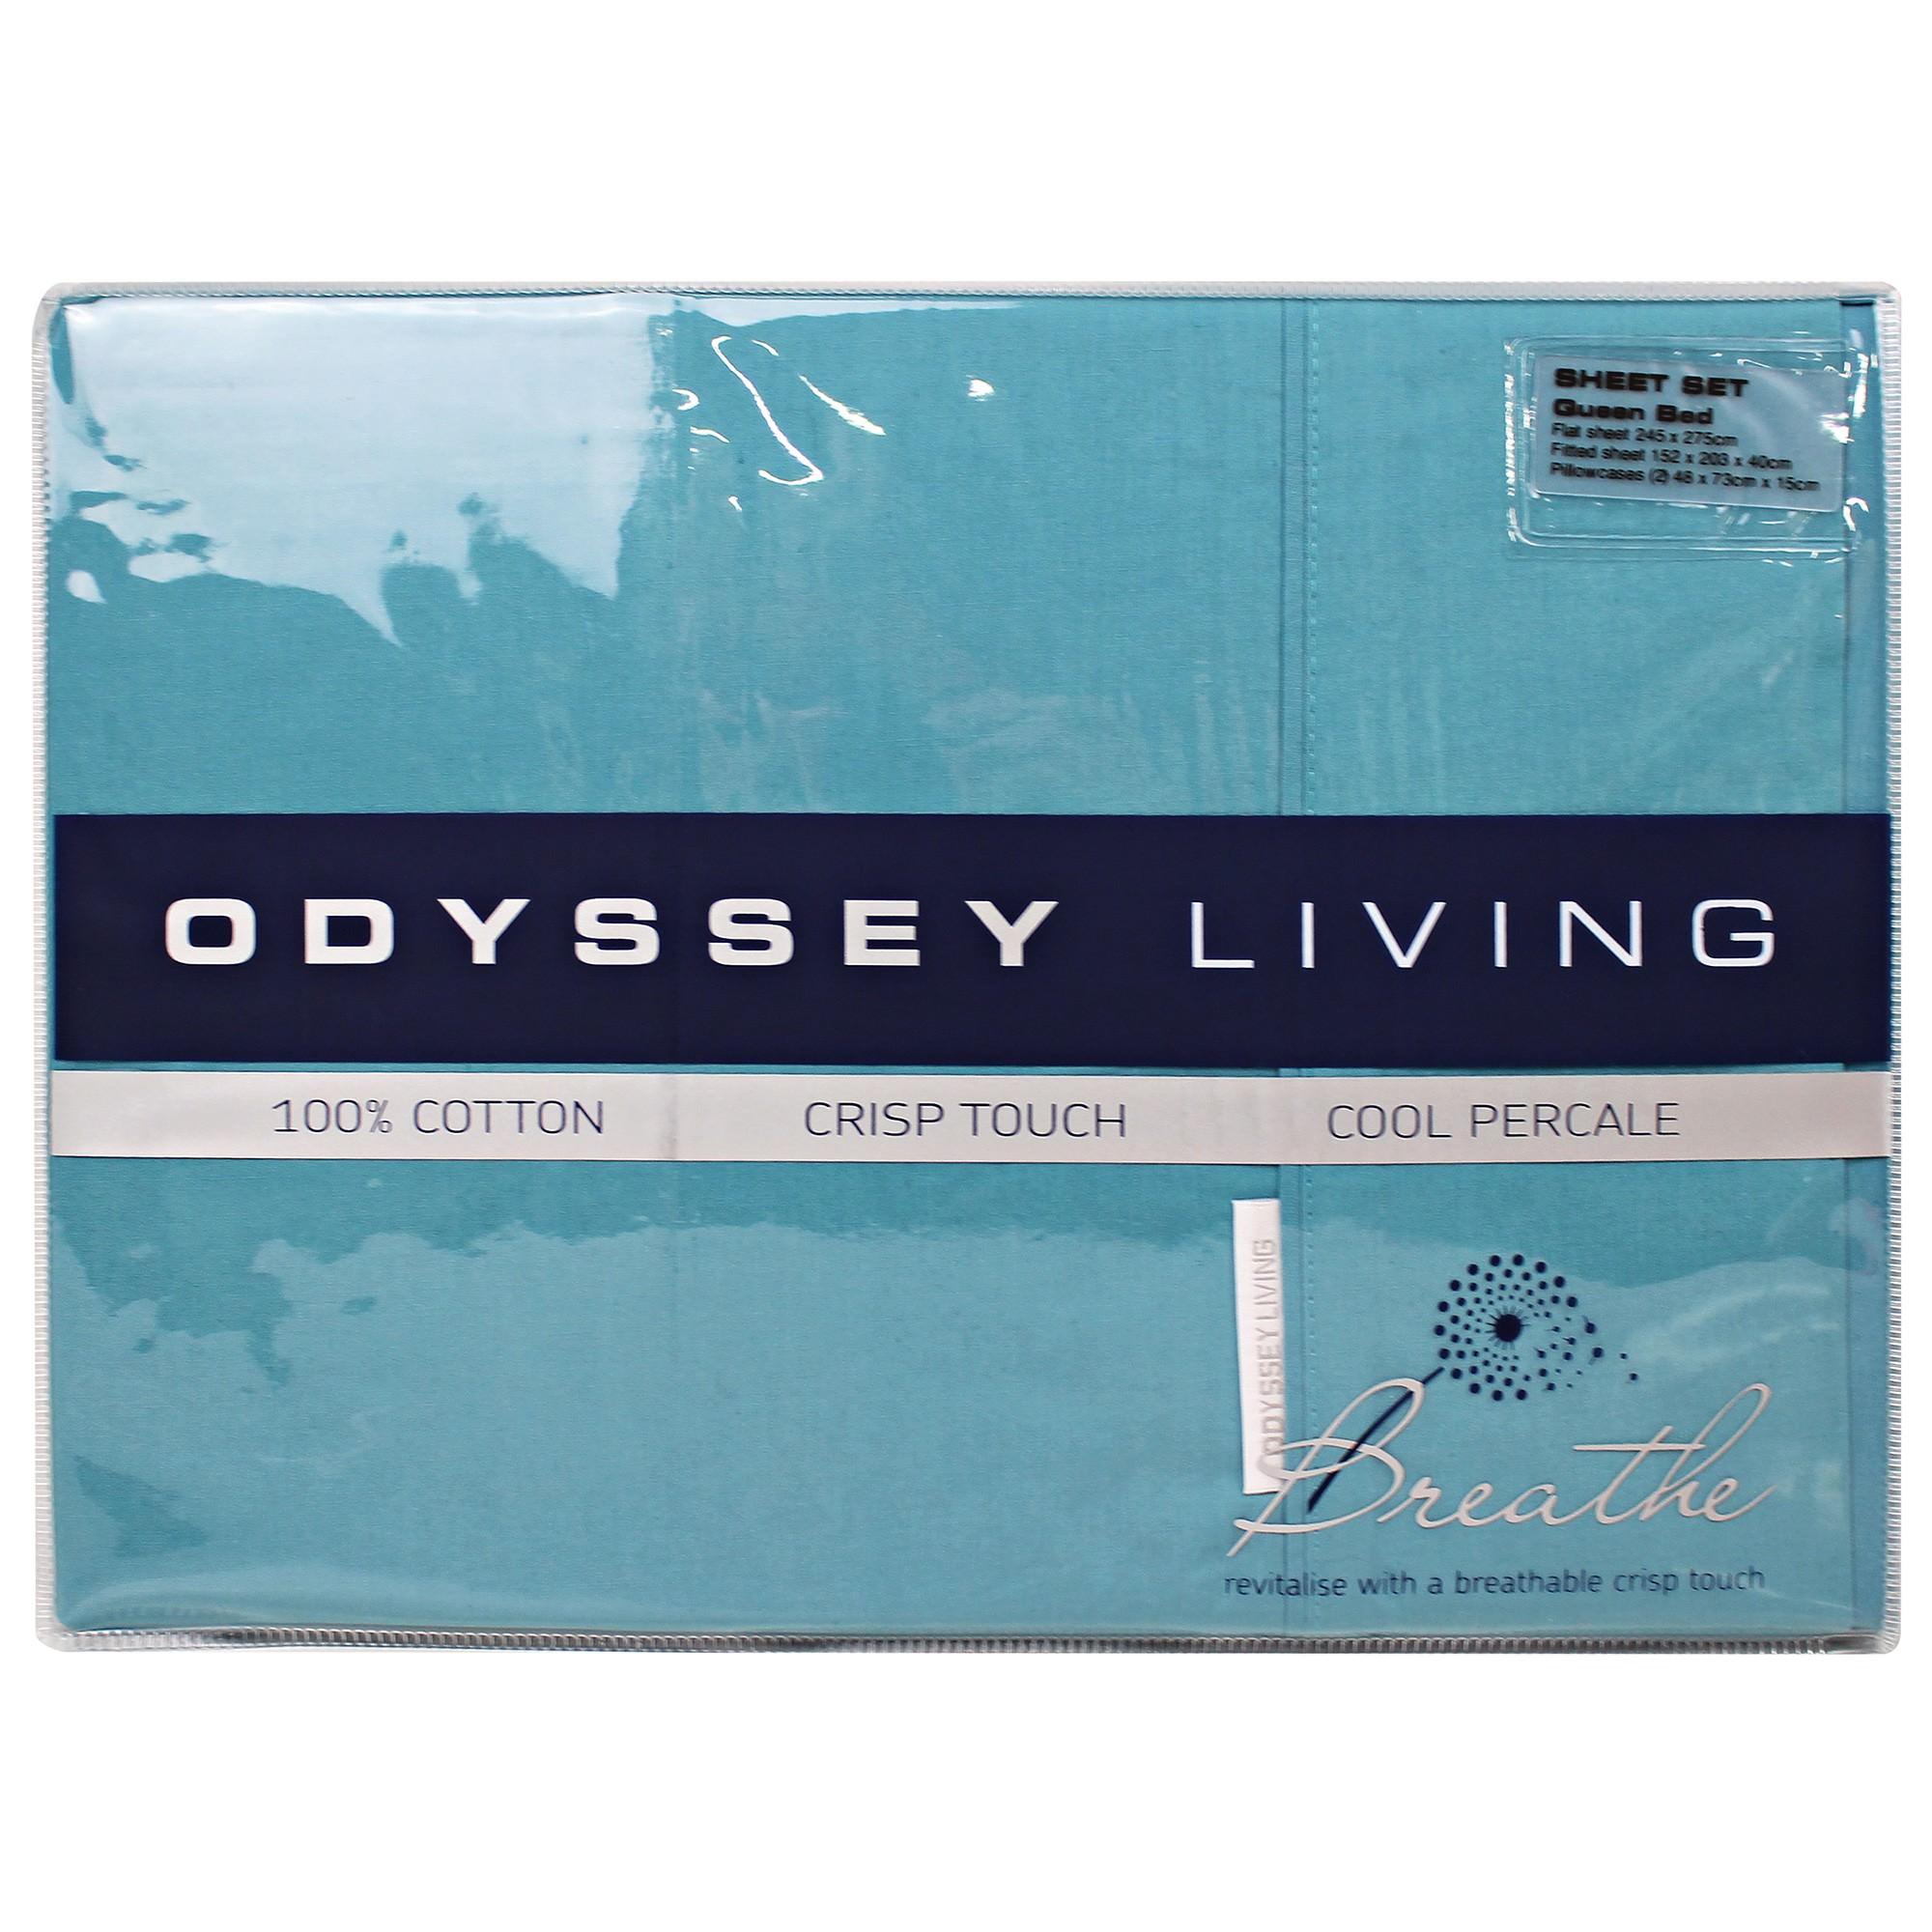 Odyssey Living Breathe 100% Cotton Sheet Set, Queen, Baltic Blue